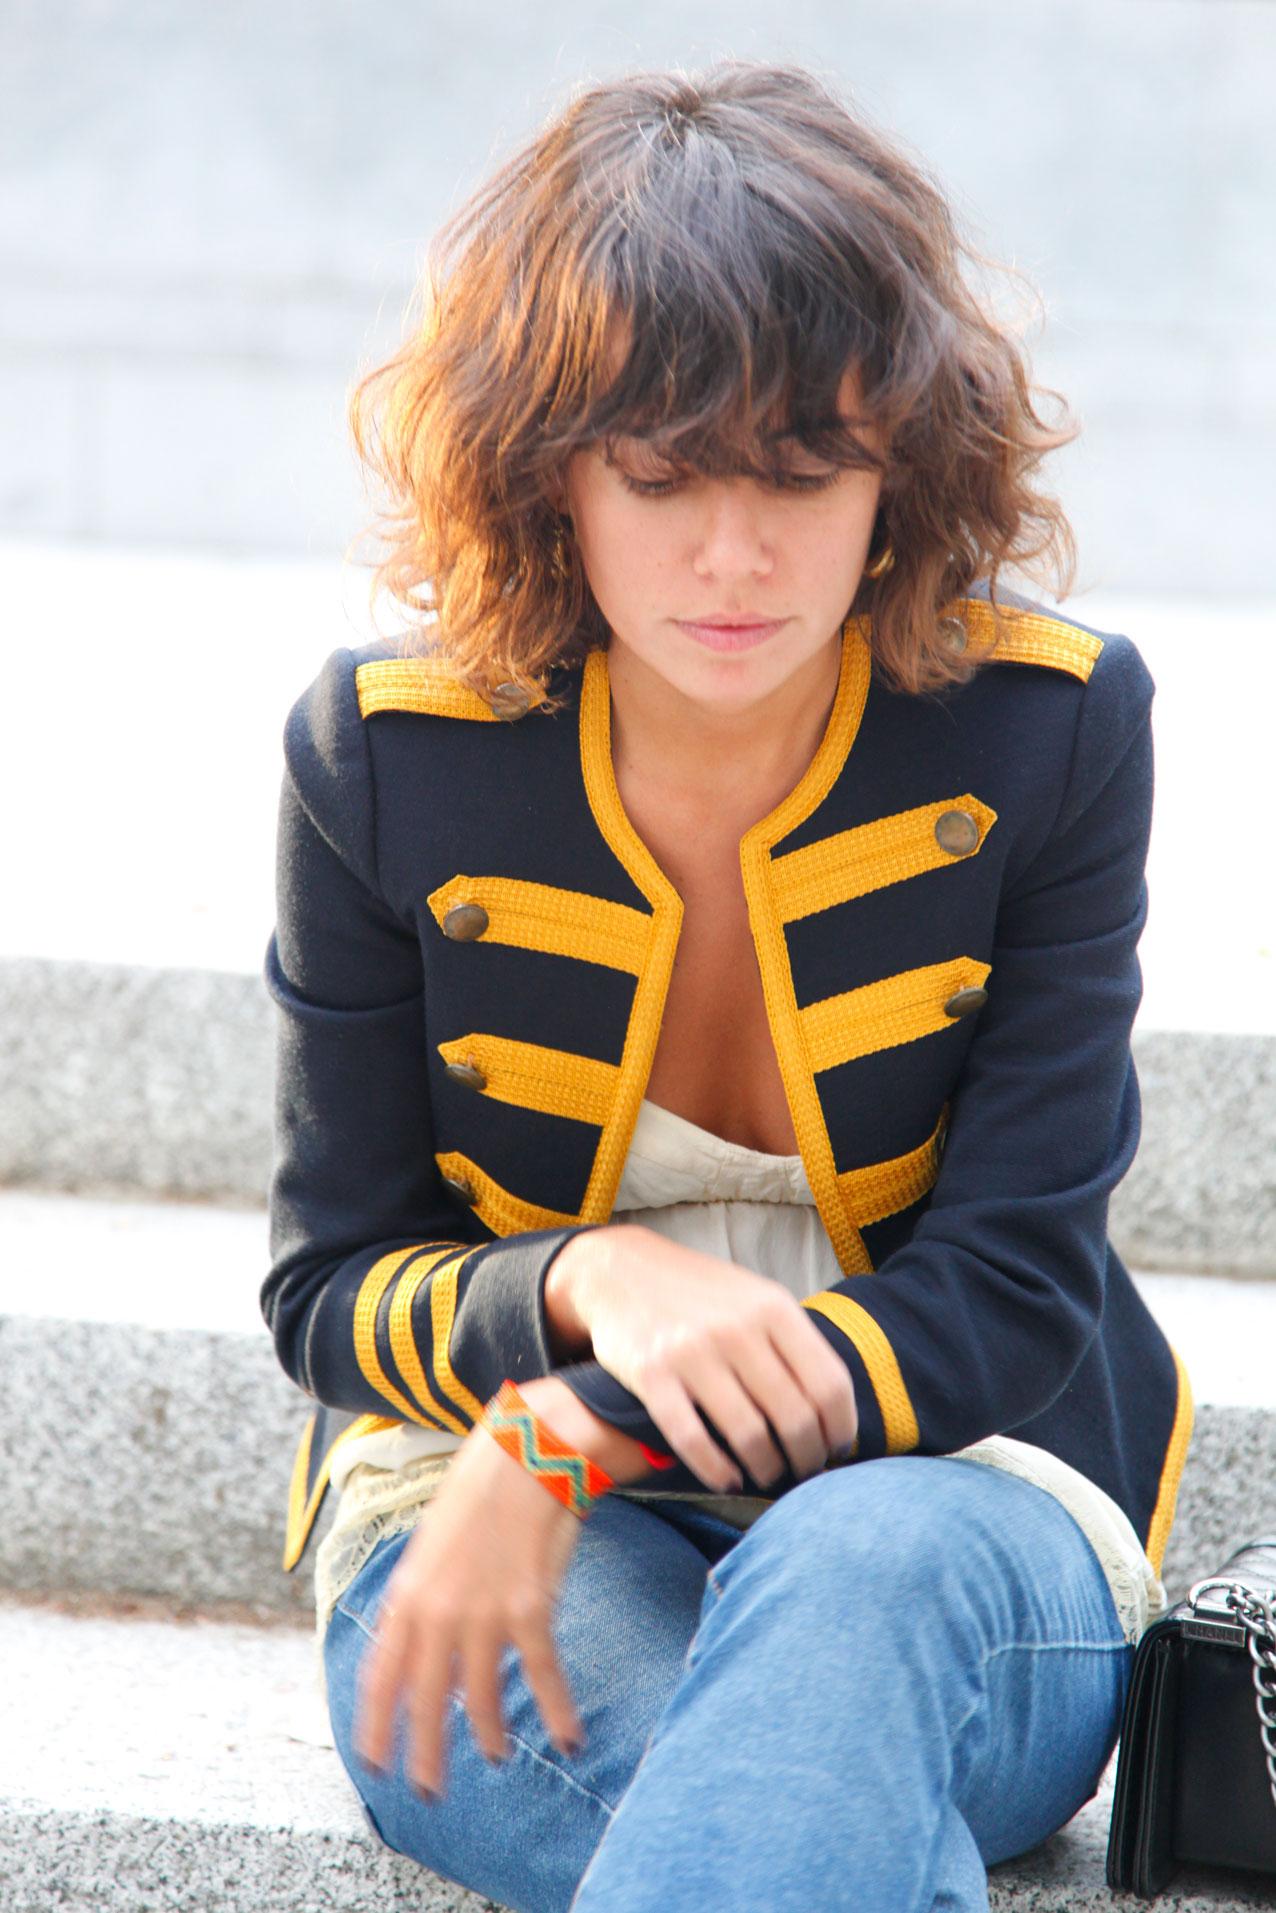 militar_jacket-lencero_autumn_look_miumiu_ballerinas_streetstyle-cool_lemonade-4